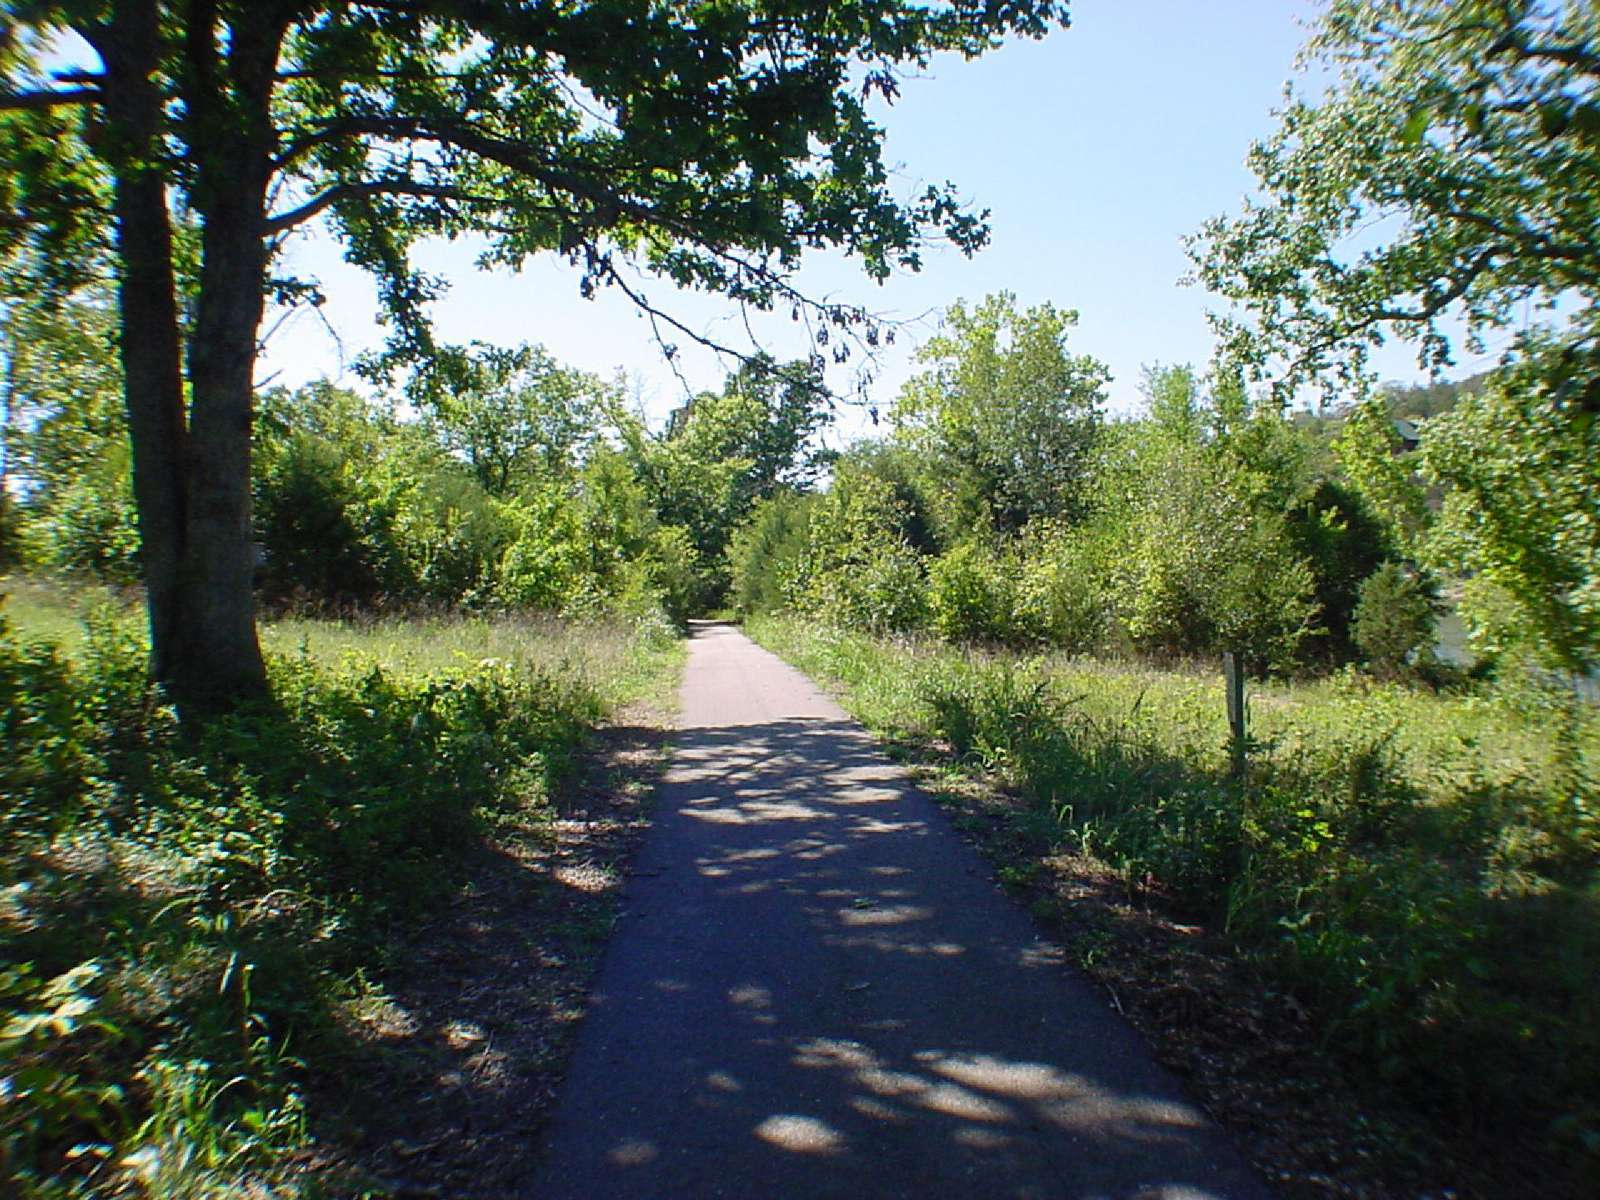 Walking trail at property edge